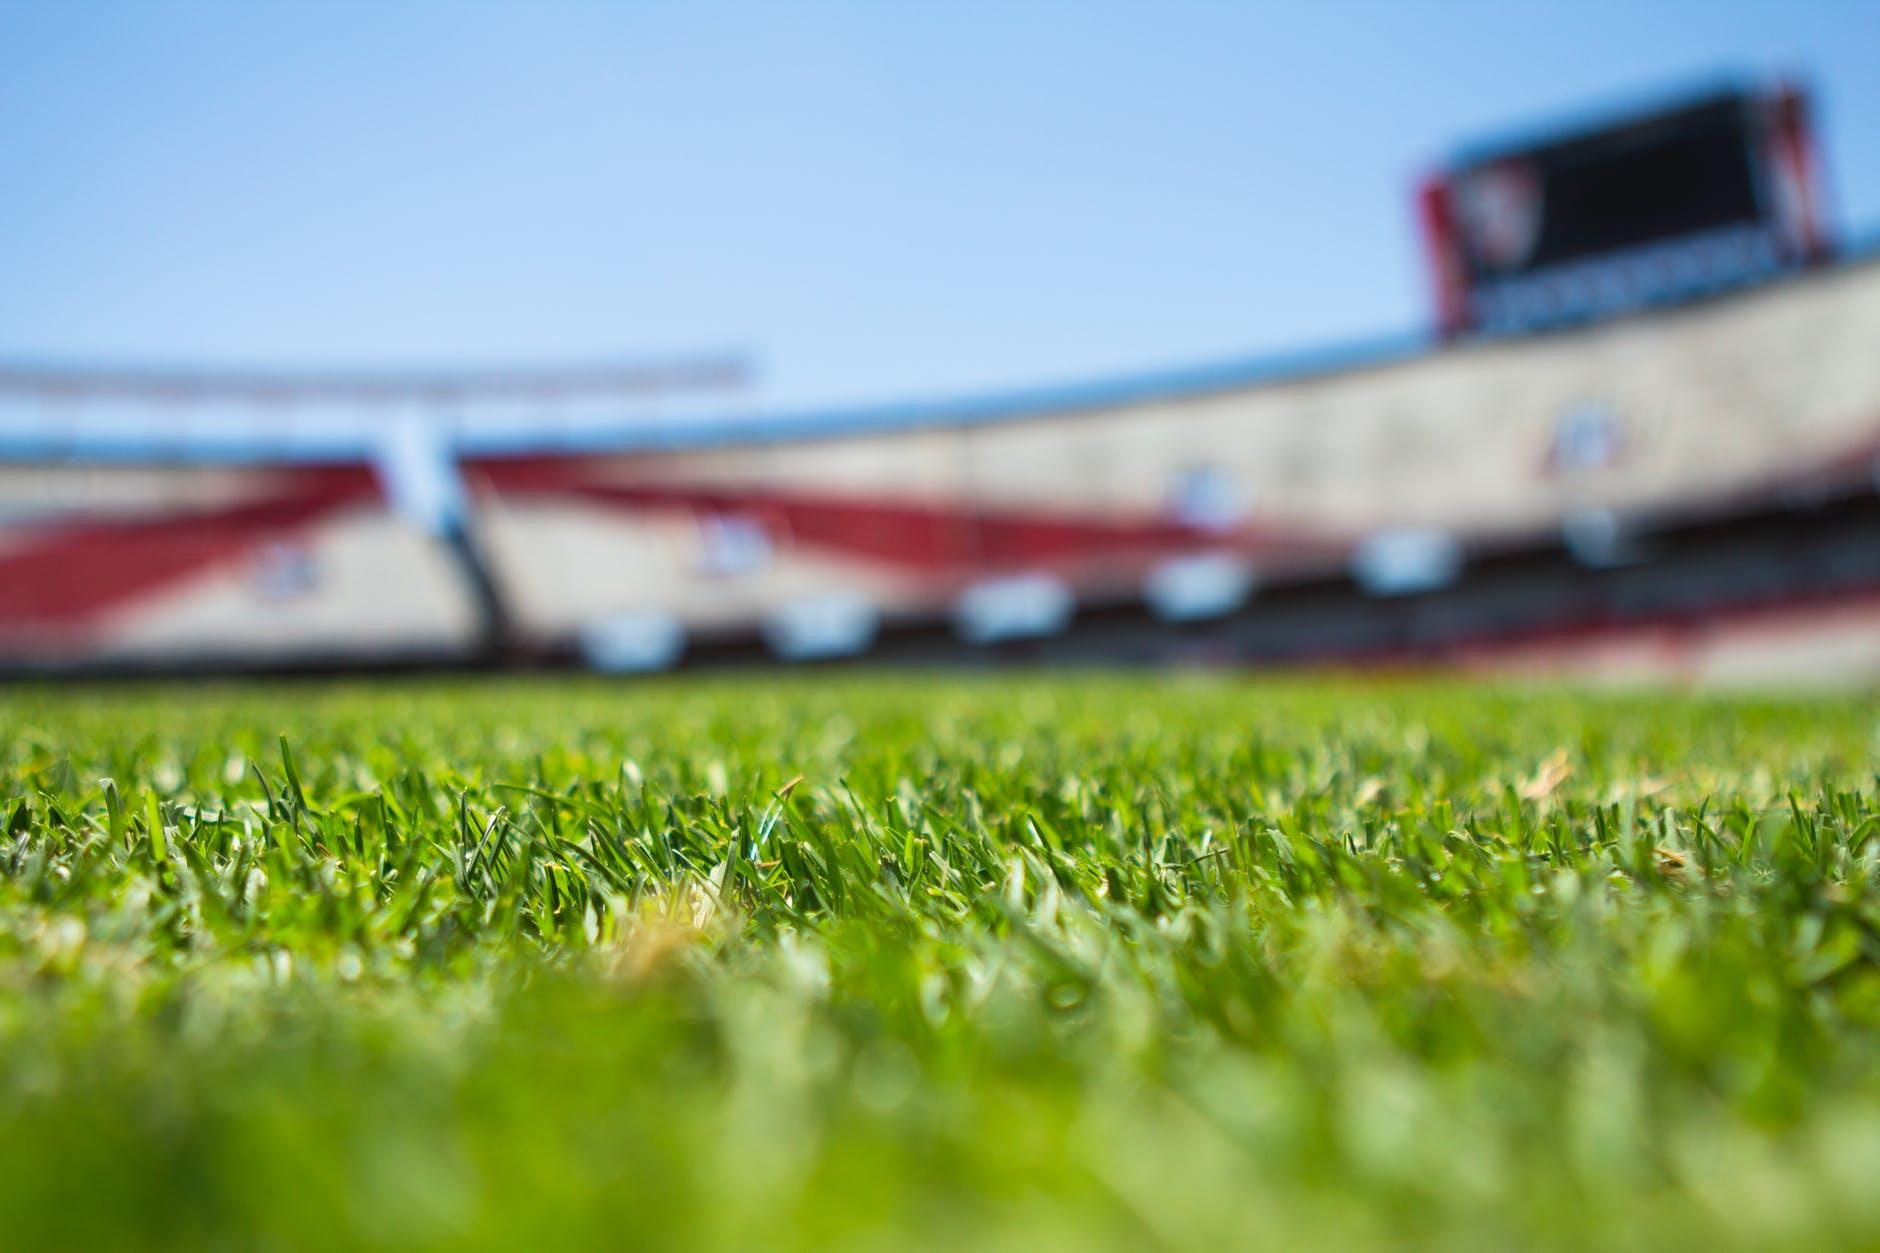 green grass across beige red open sports stadium during daytime